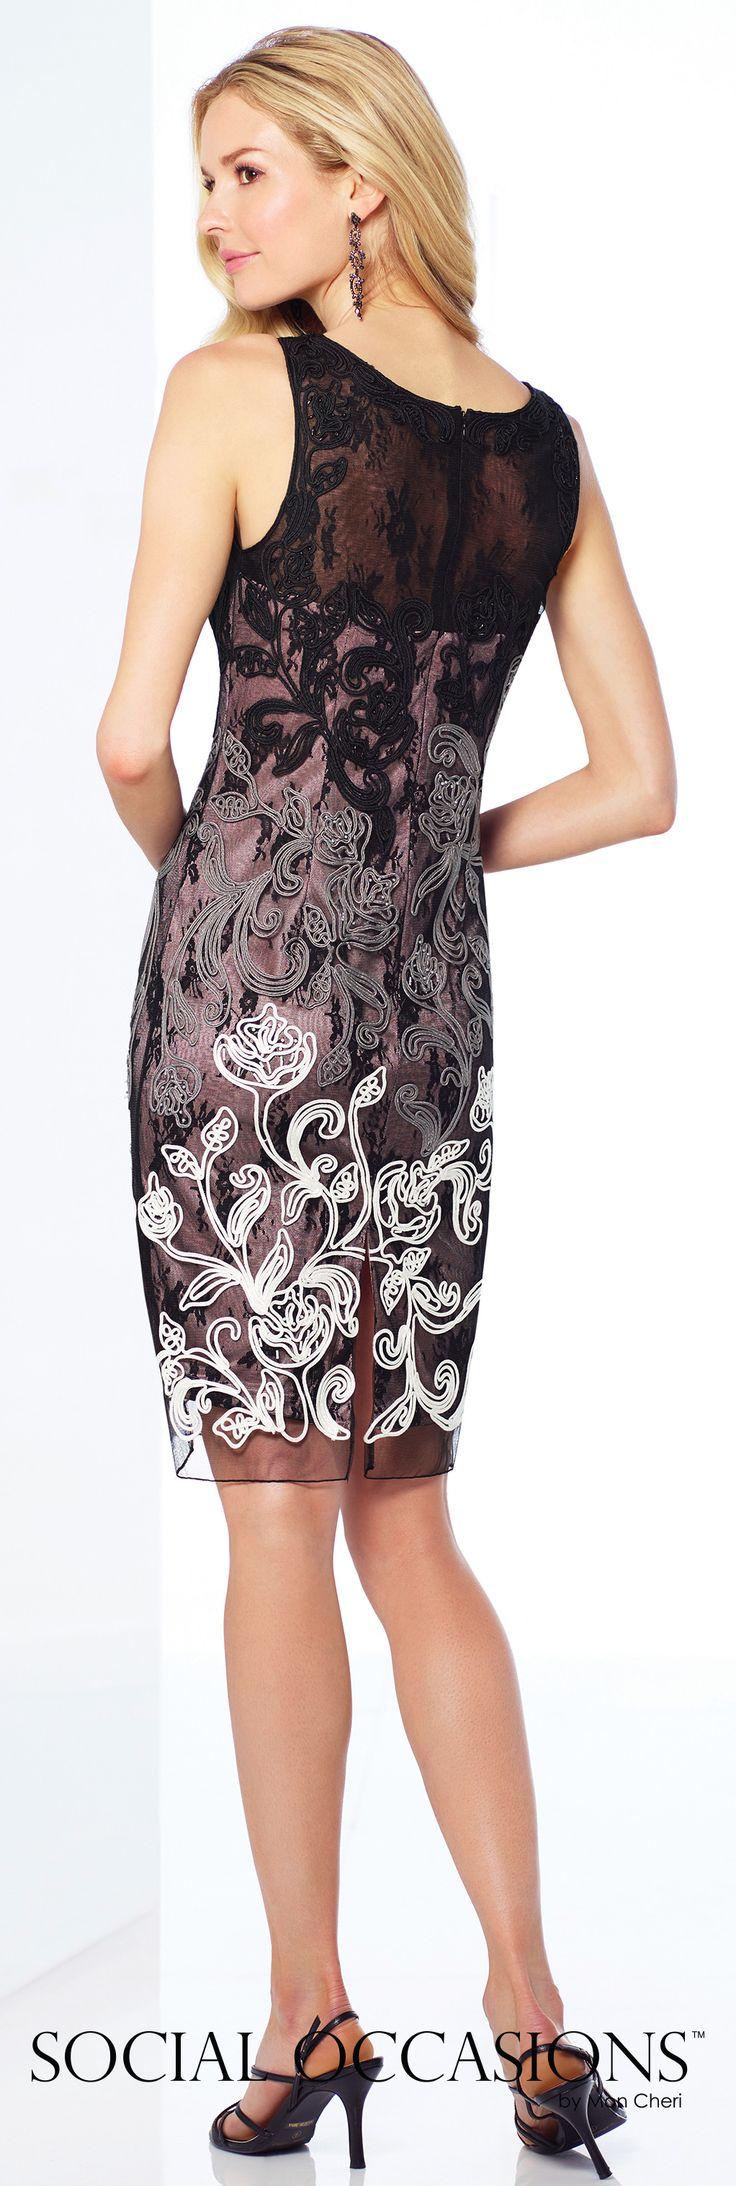 Best 25+ Short evening dresses ideas on Pinterest | Hi low outfits ...